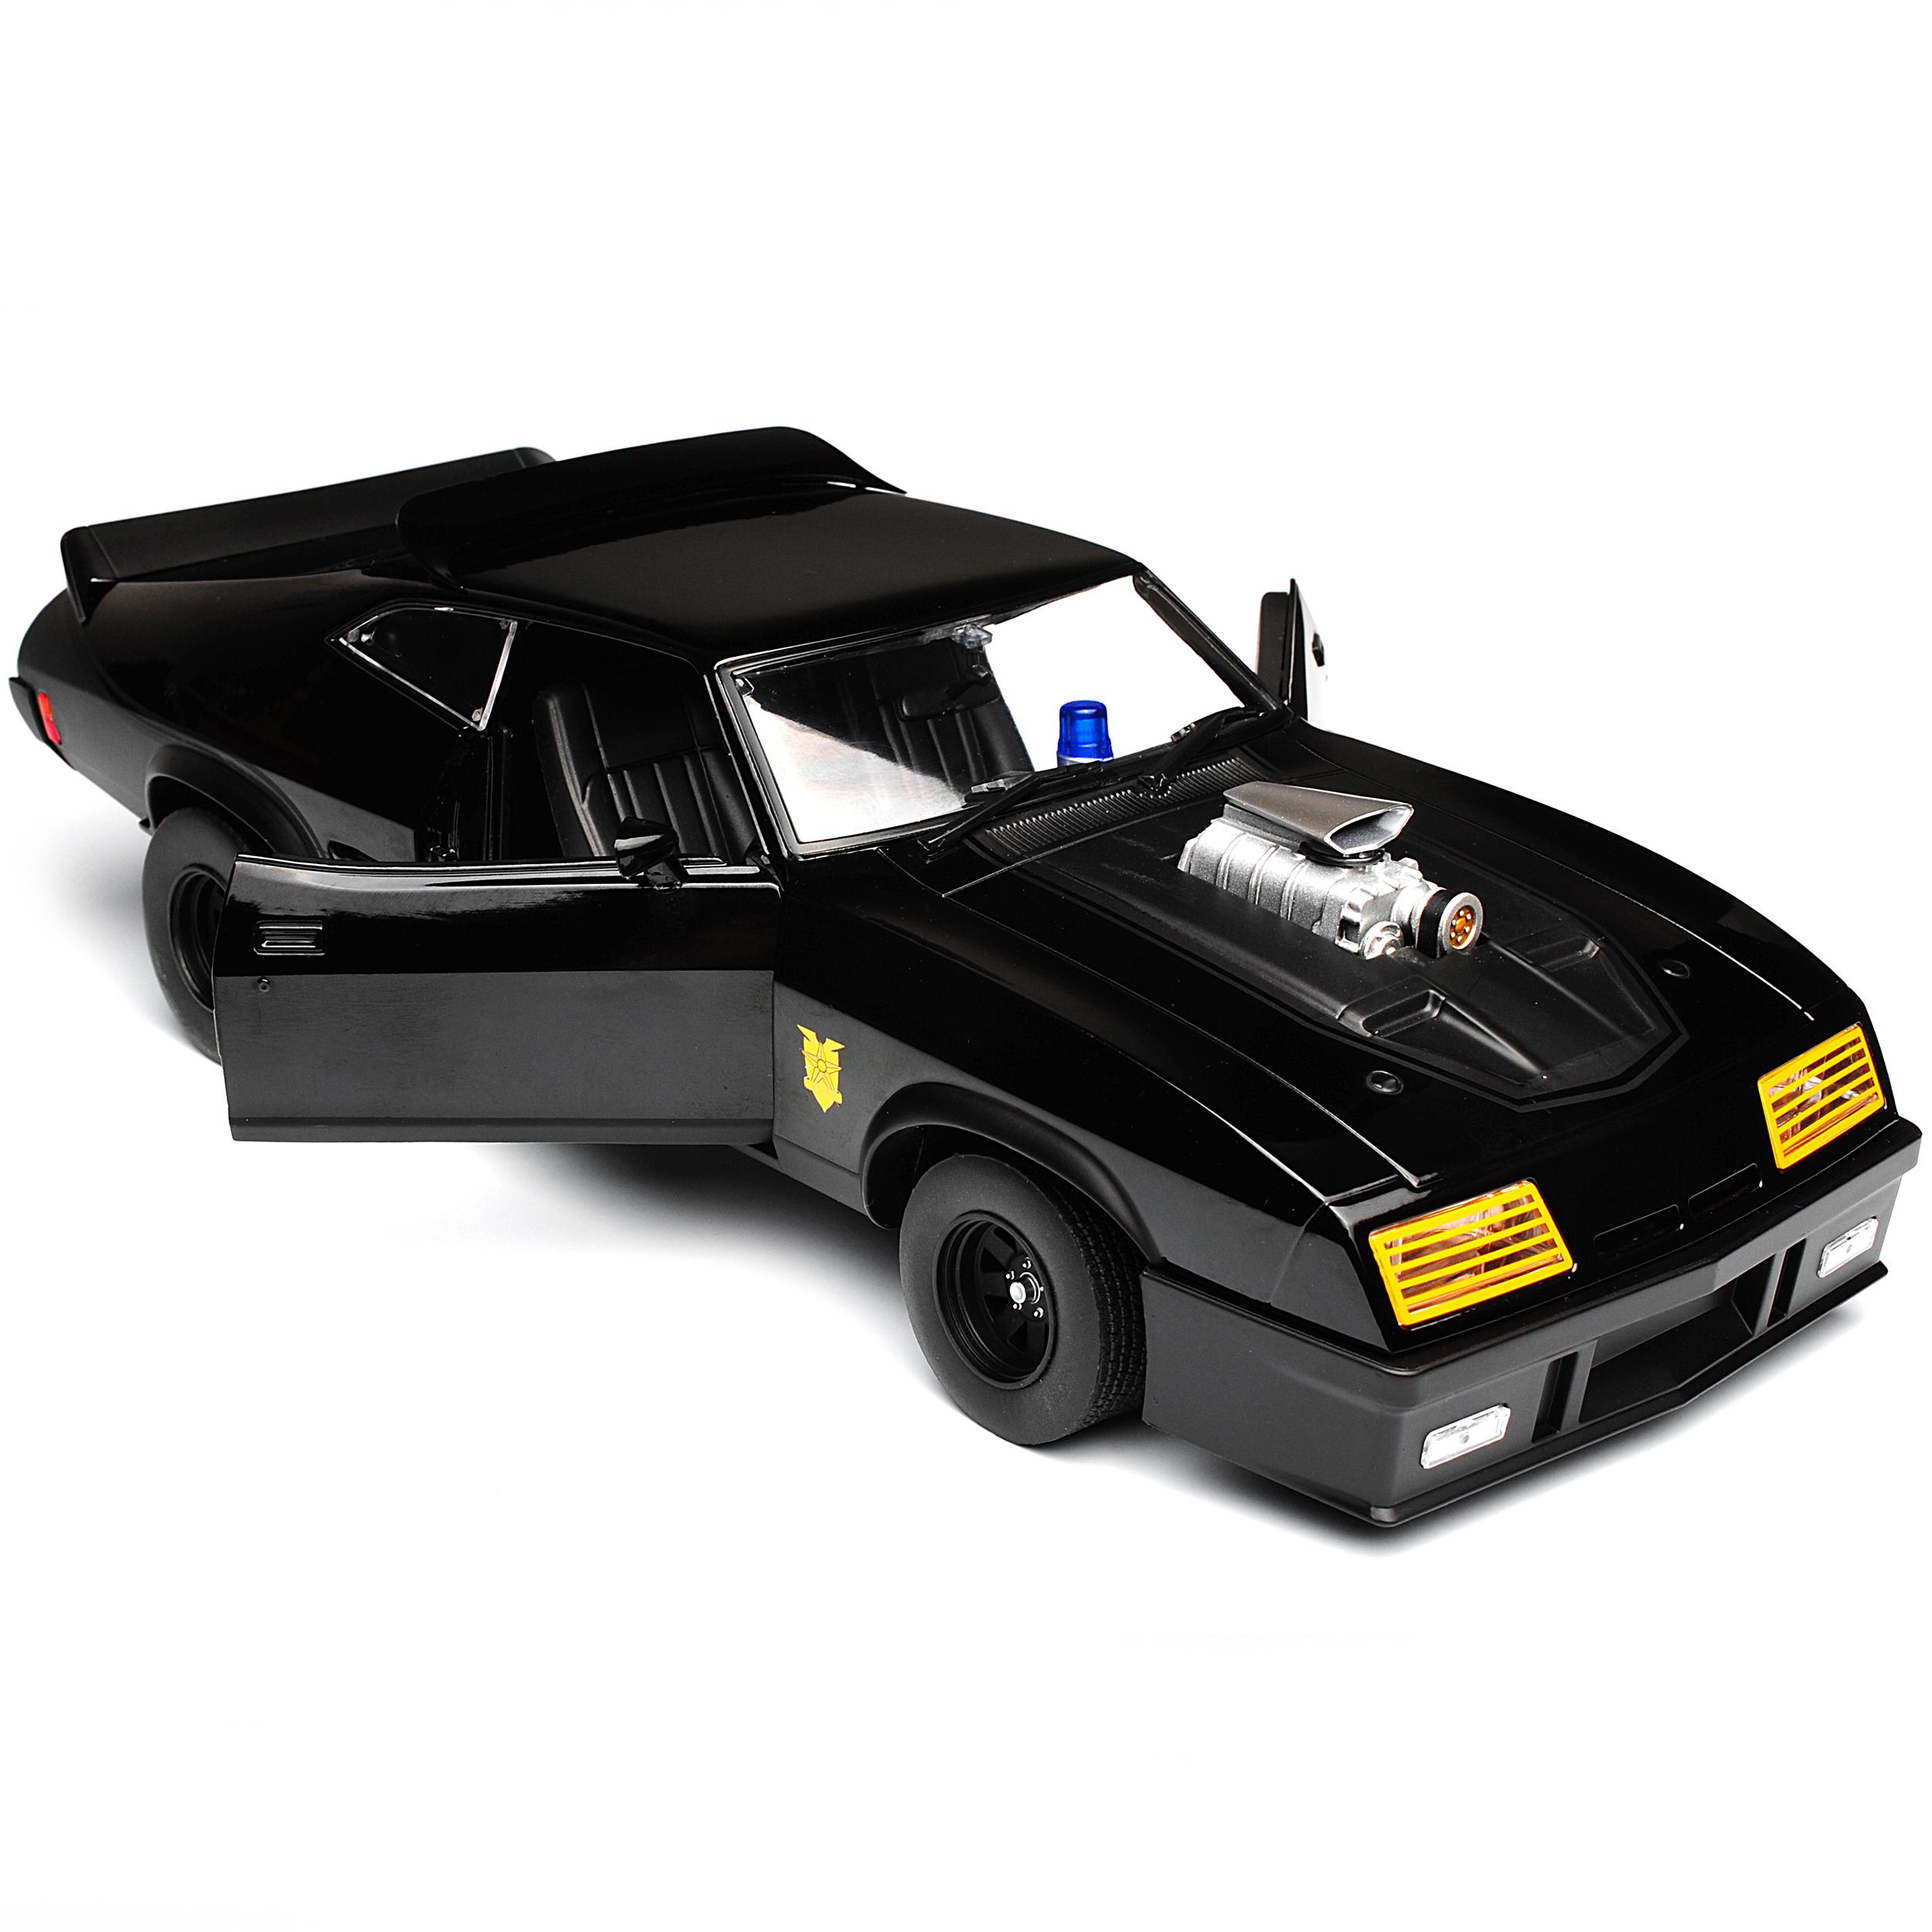 Ford-XB-Falcon-sintonizada-version-Mad-Max-II-2-negra-interceptor-negro-1973-1-18 miniatura 9